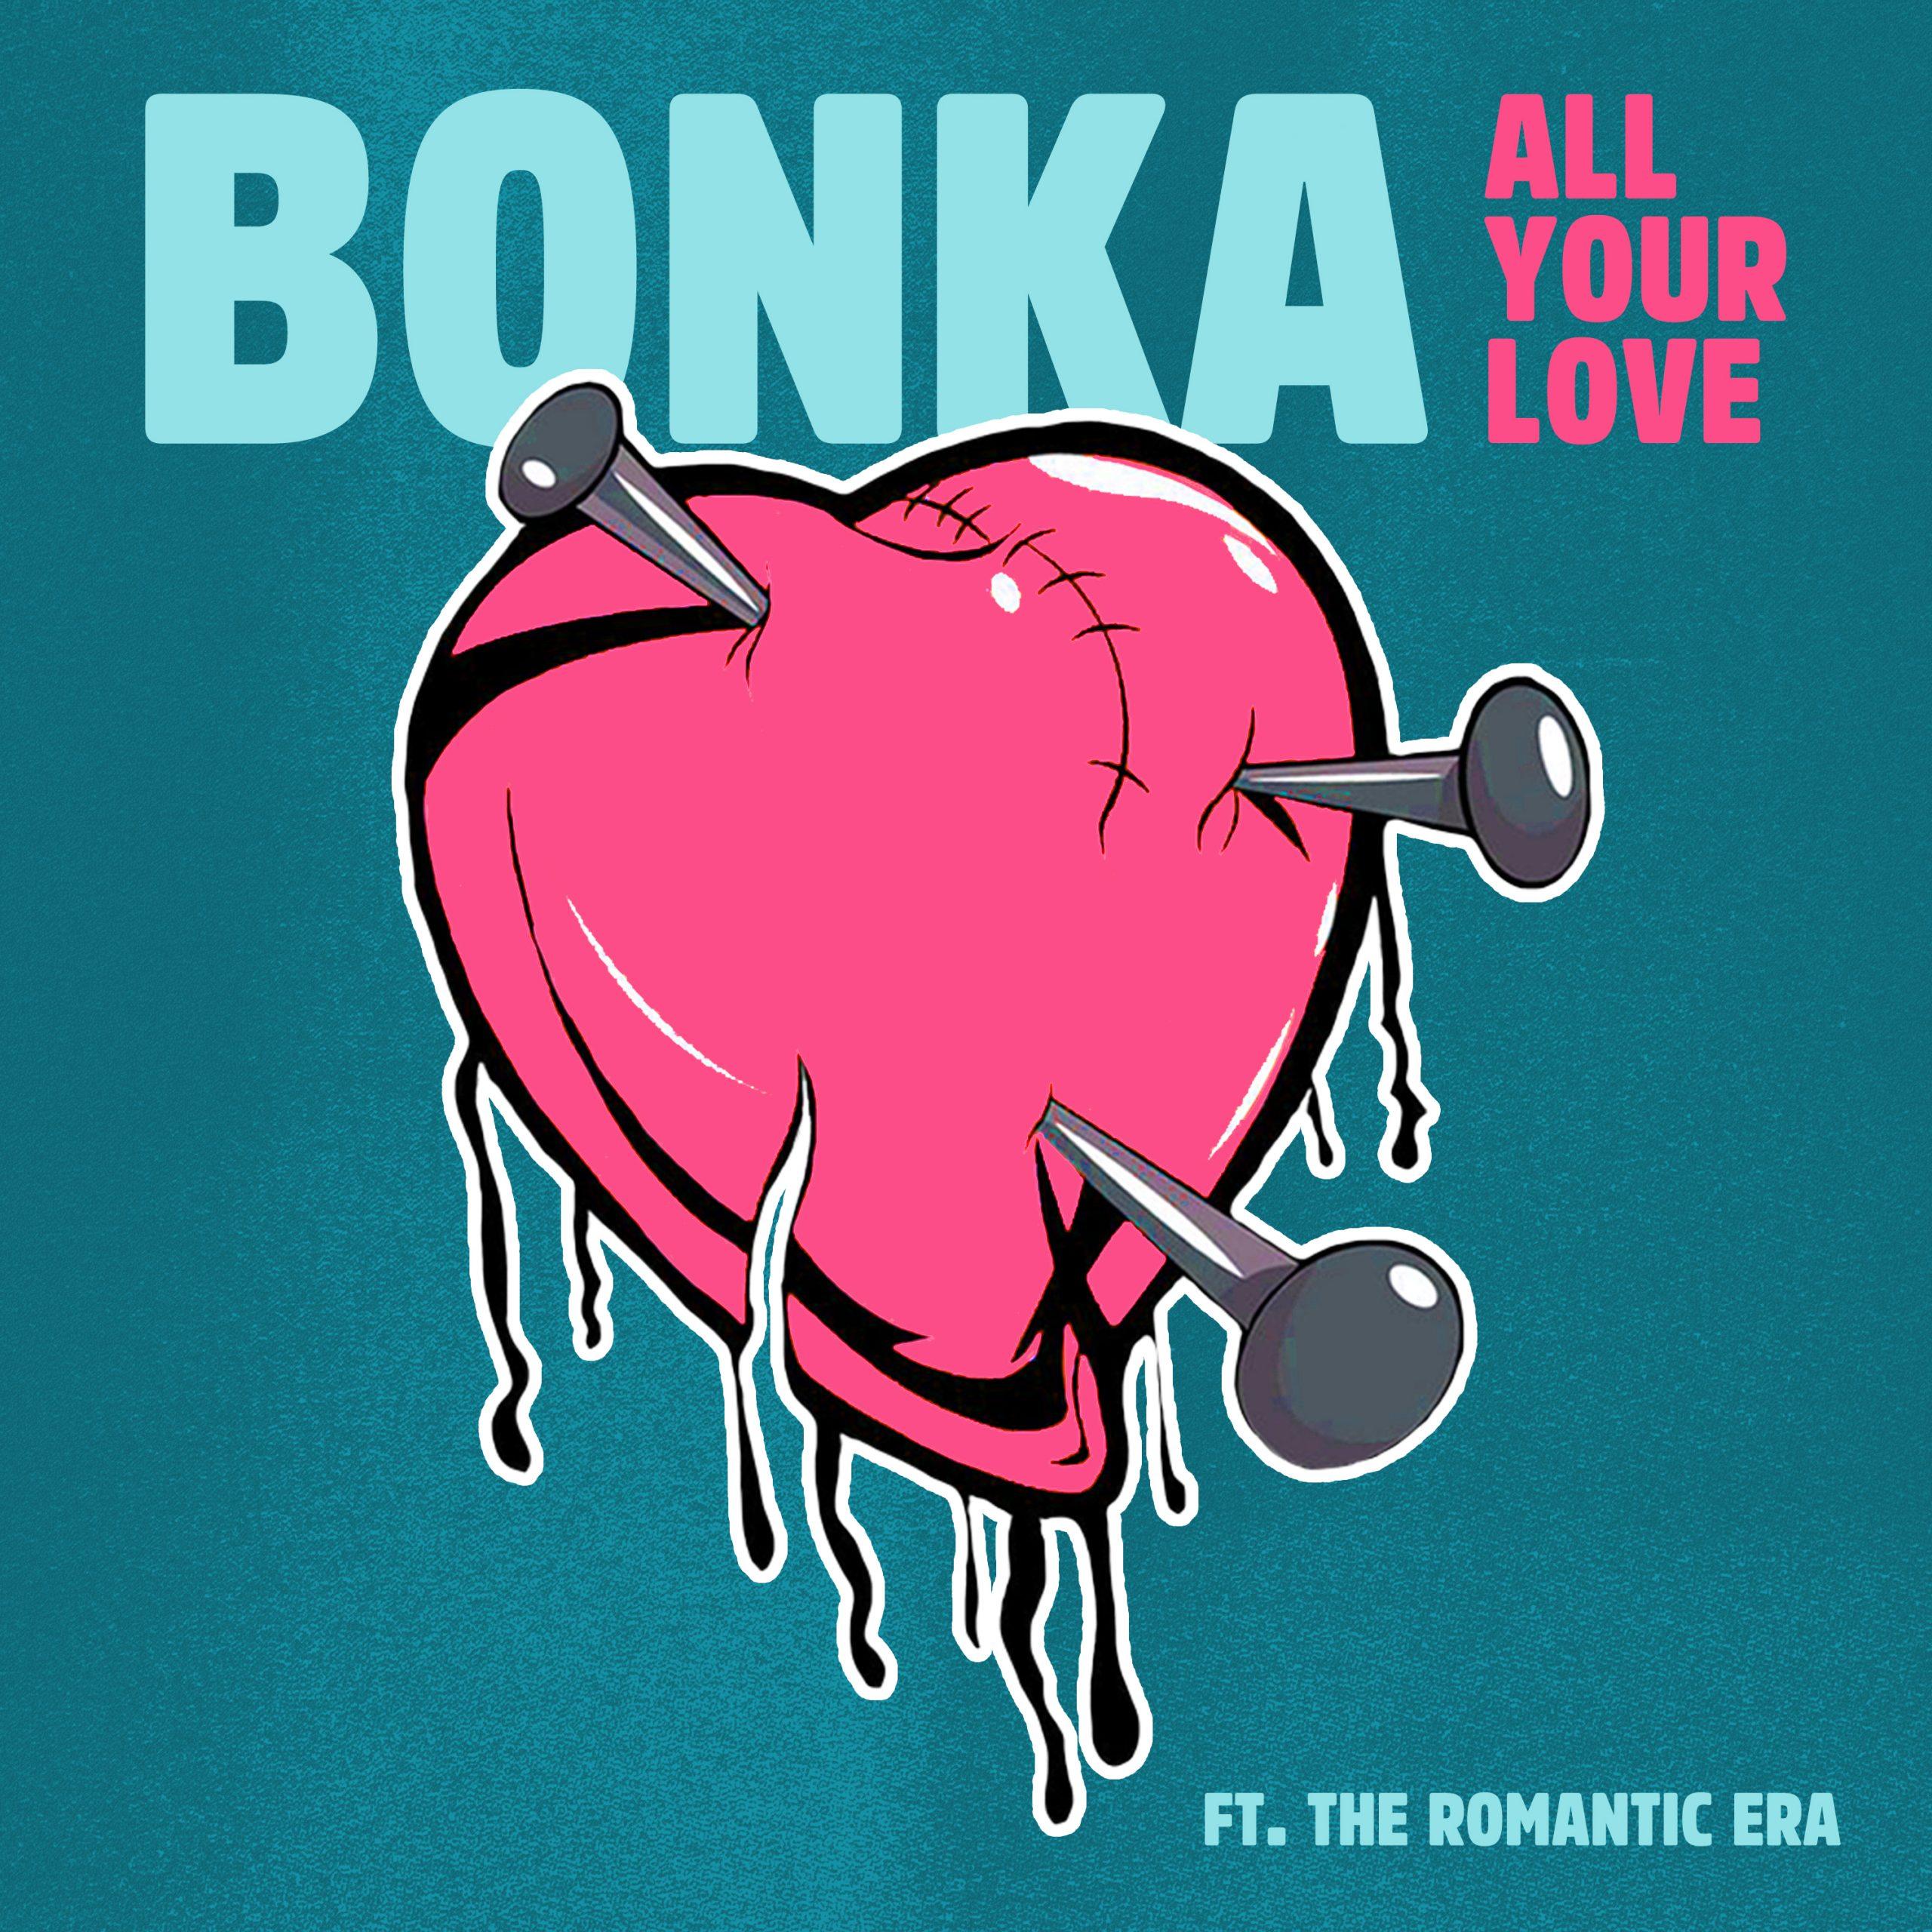 Bonka_AllYour Love_Final-2